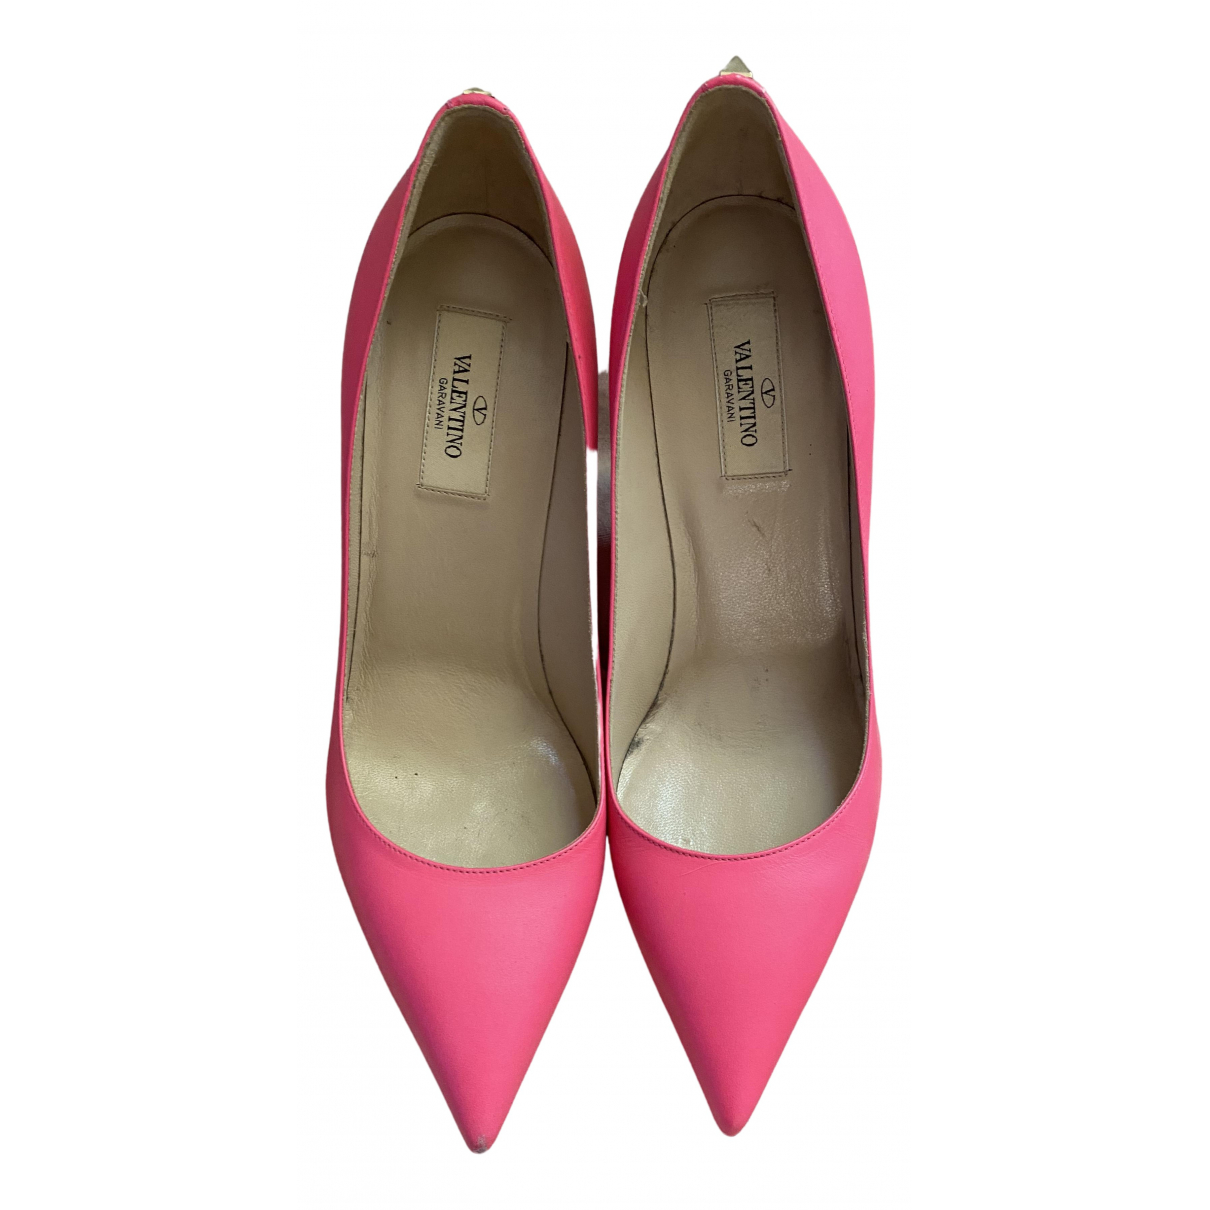 Valentino Garavani Rockstud Leather Heels for Women 39 EU